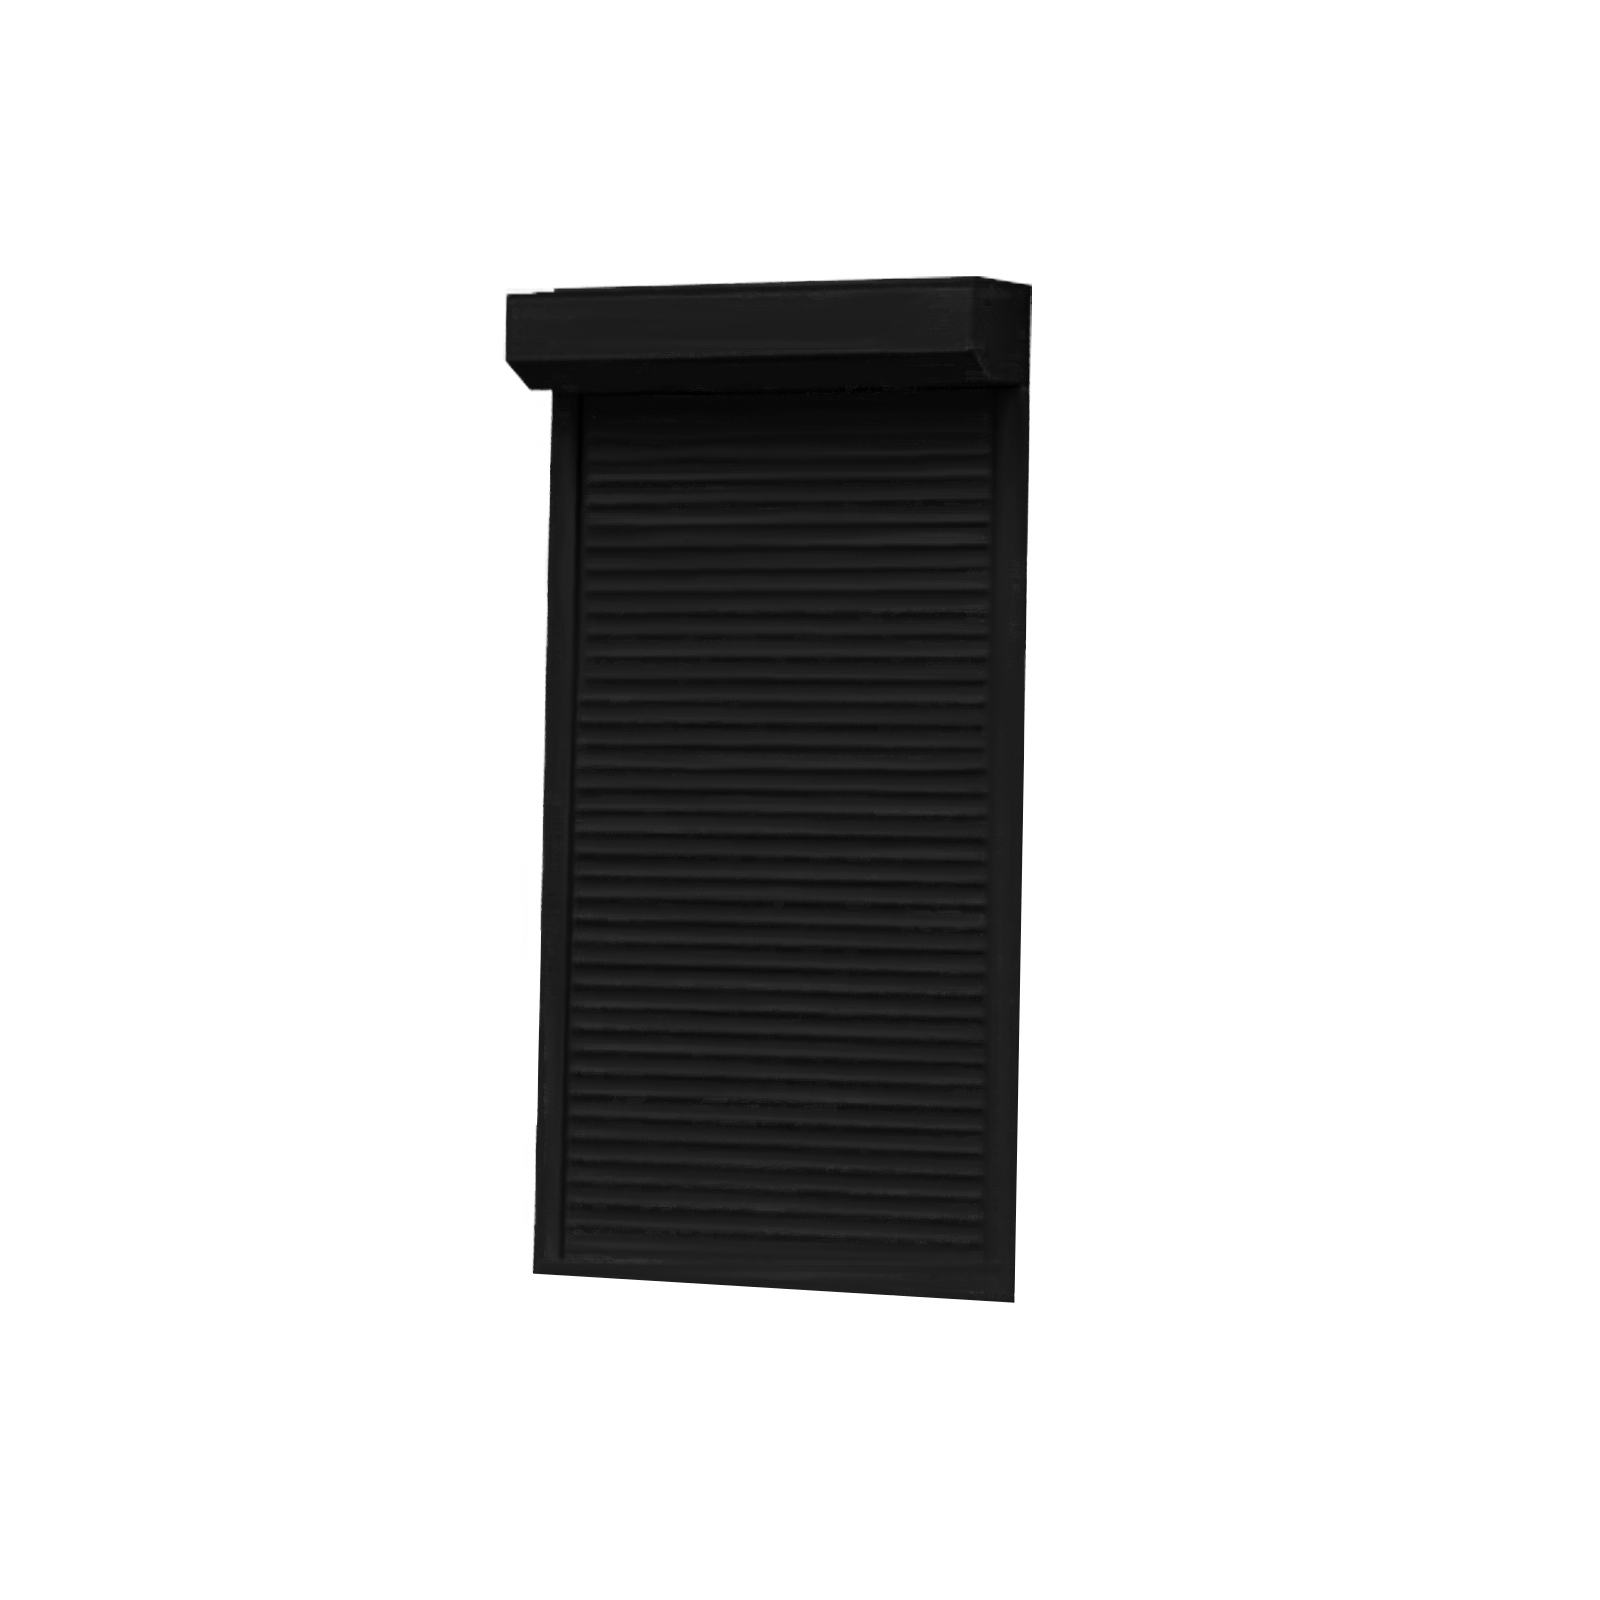 Everton 1401-1600 x 1401-1600mm On-Wall Hardwired Roller Shutter